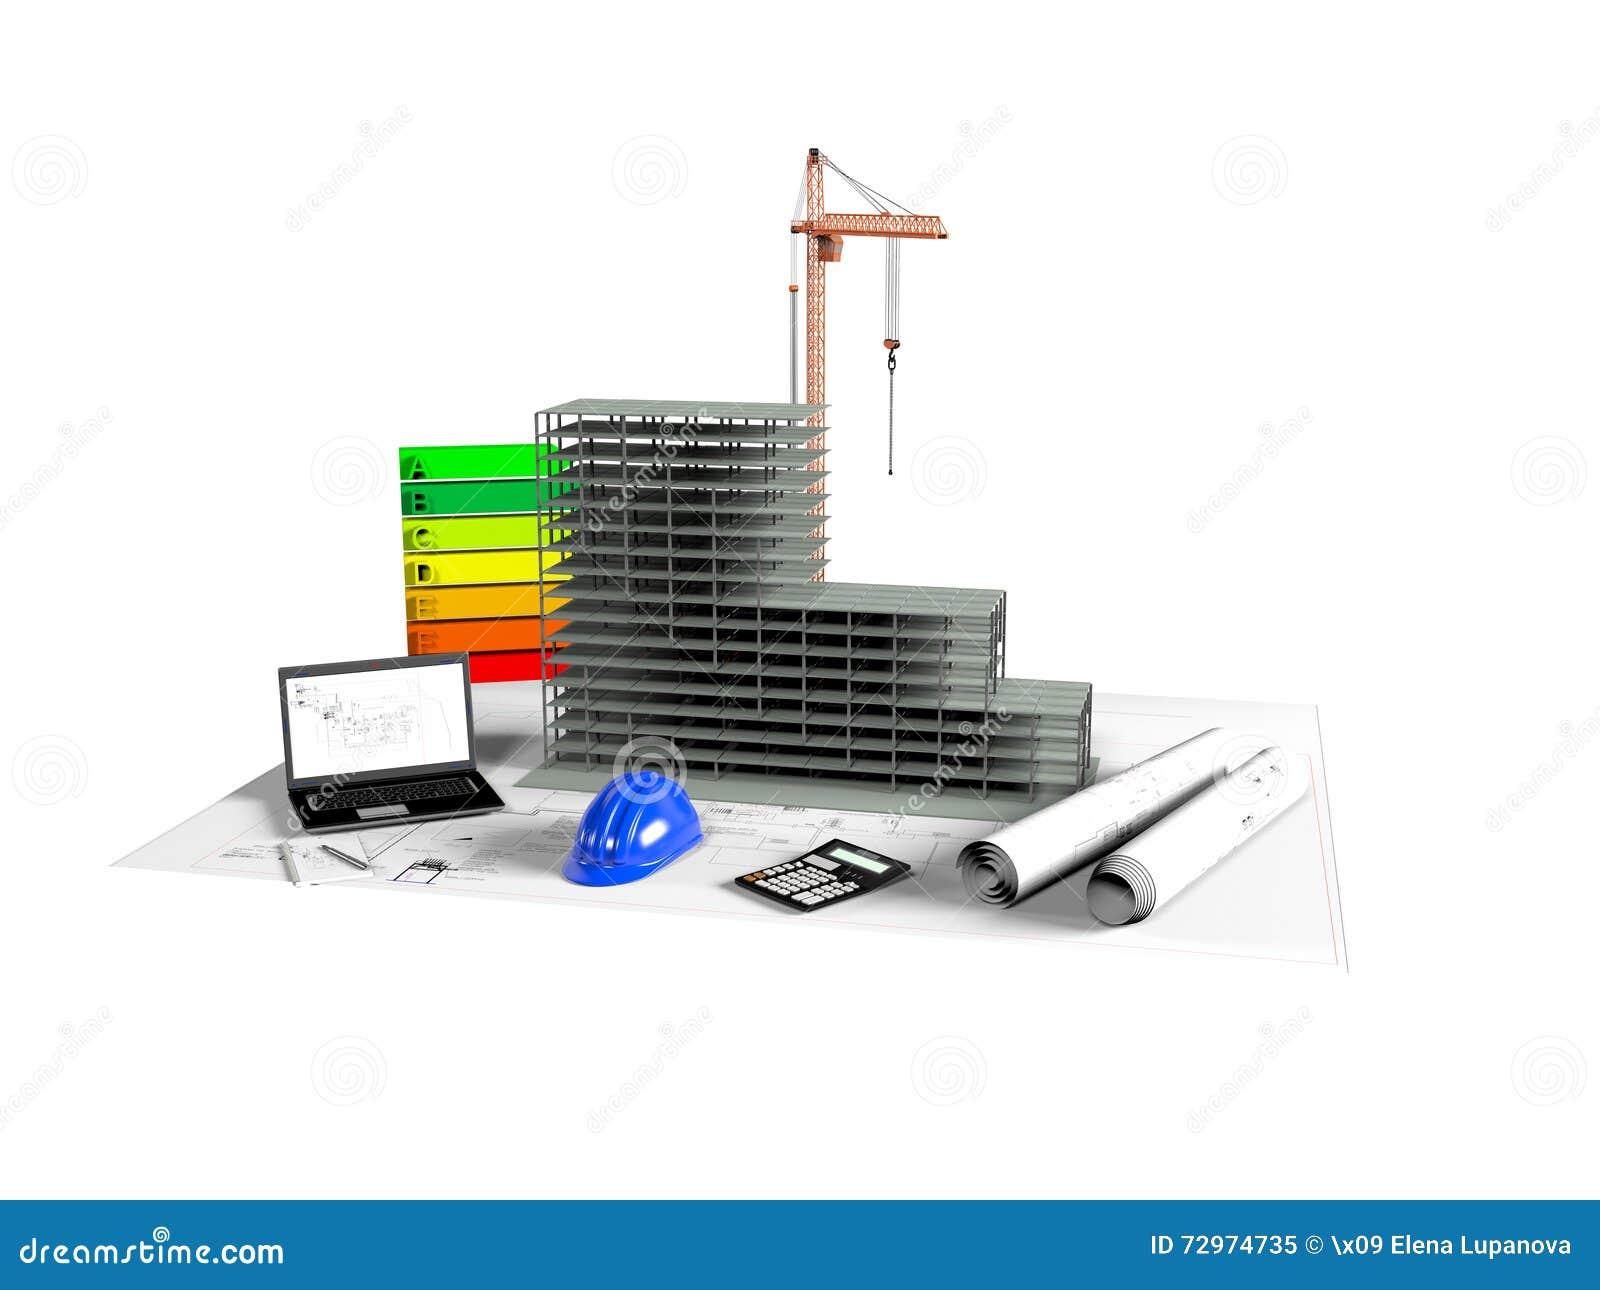 Model House Under Construction, Computer, Helmet, 3D